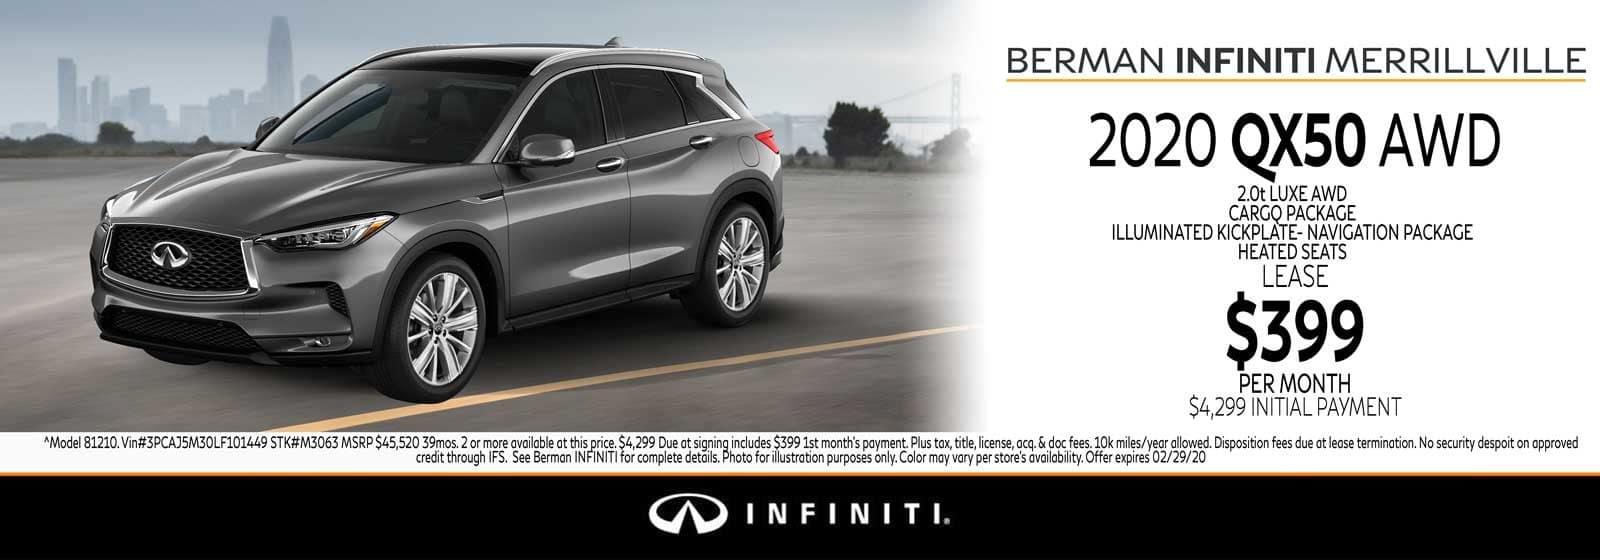 New 2020 INFINITI QX50 February Offer at Berman INFINITI of Merrillville!